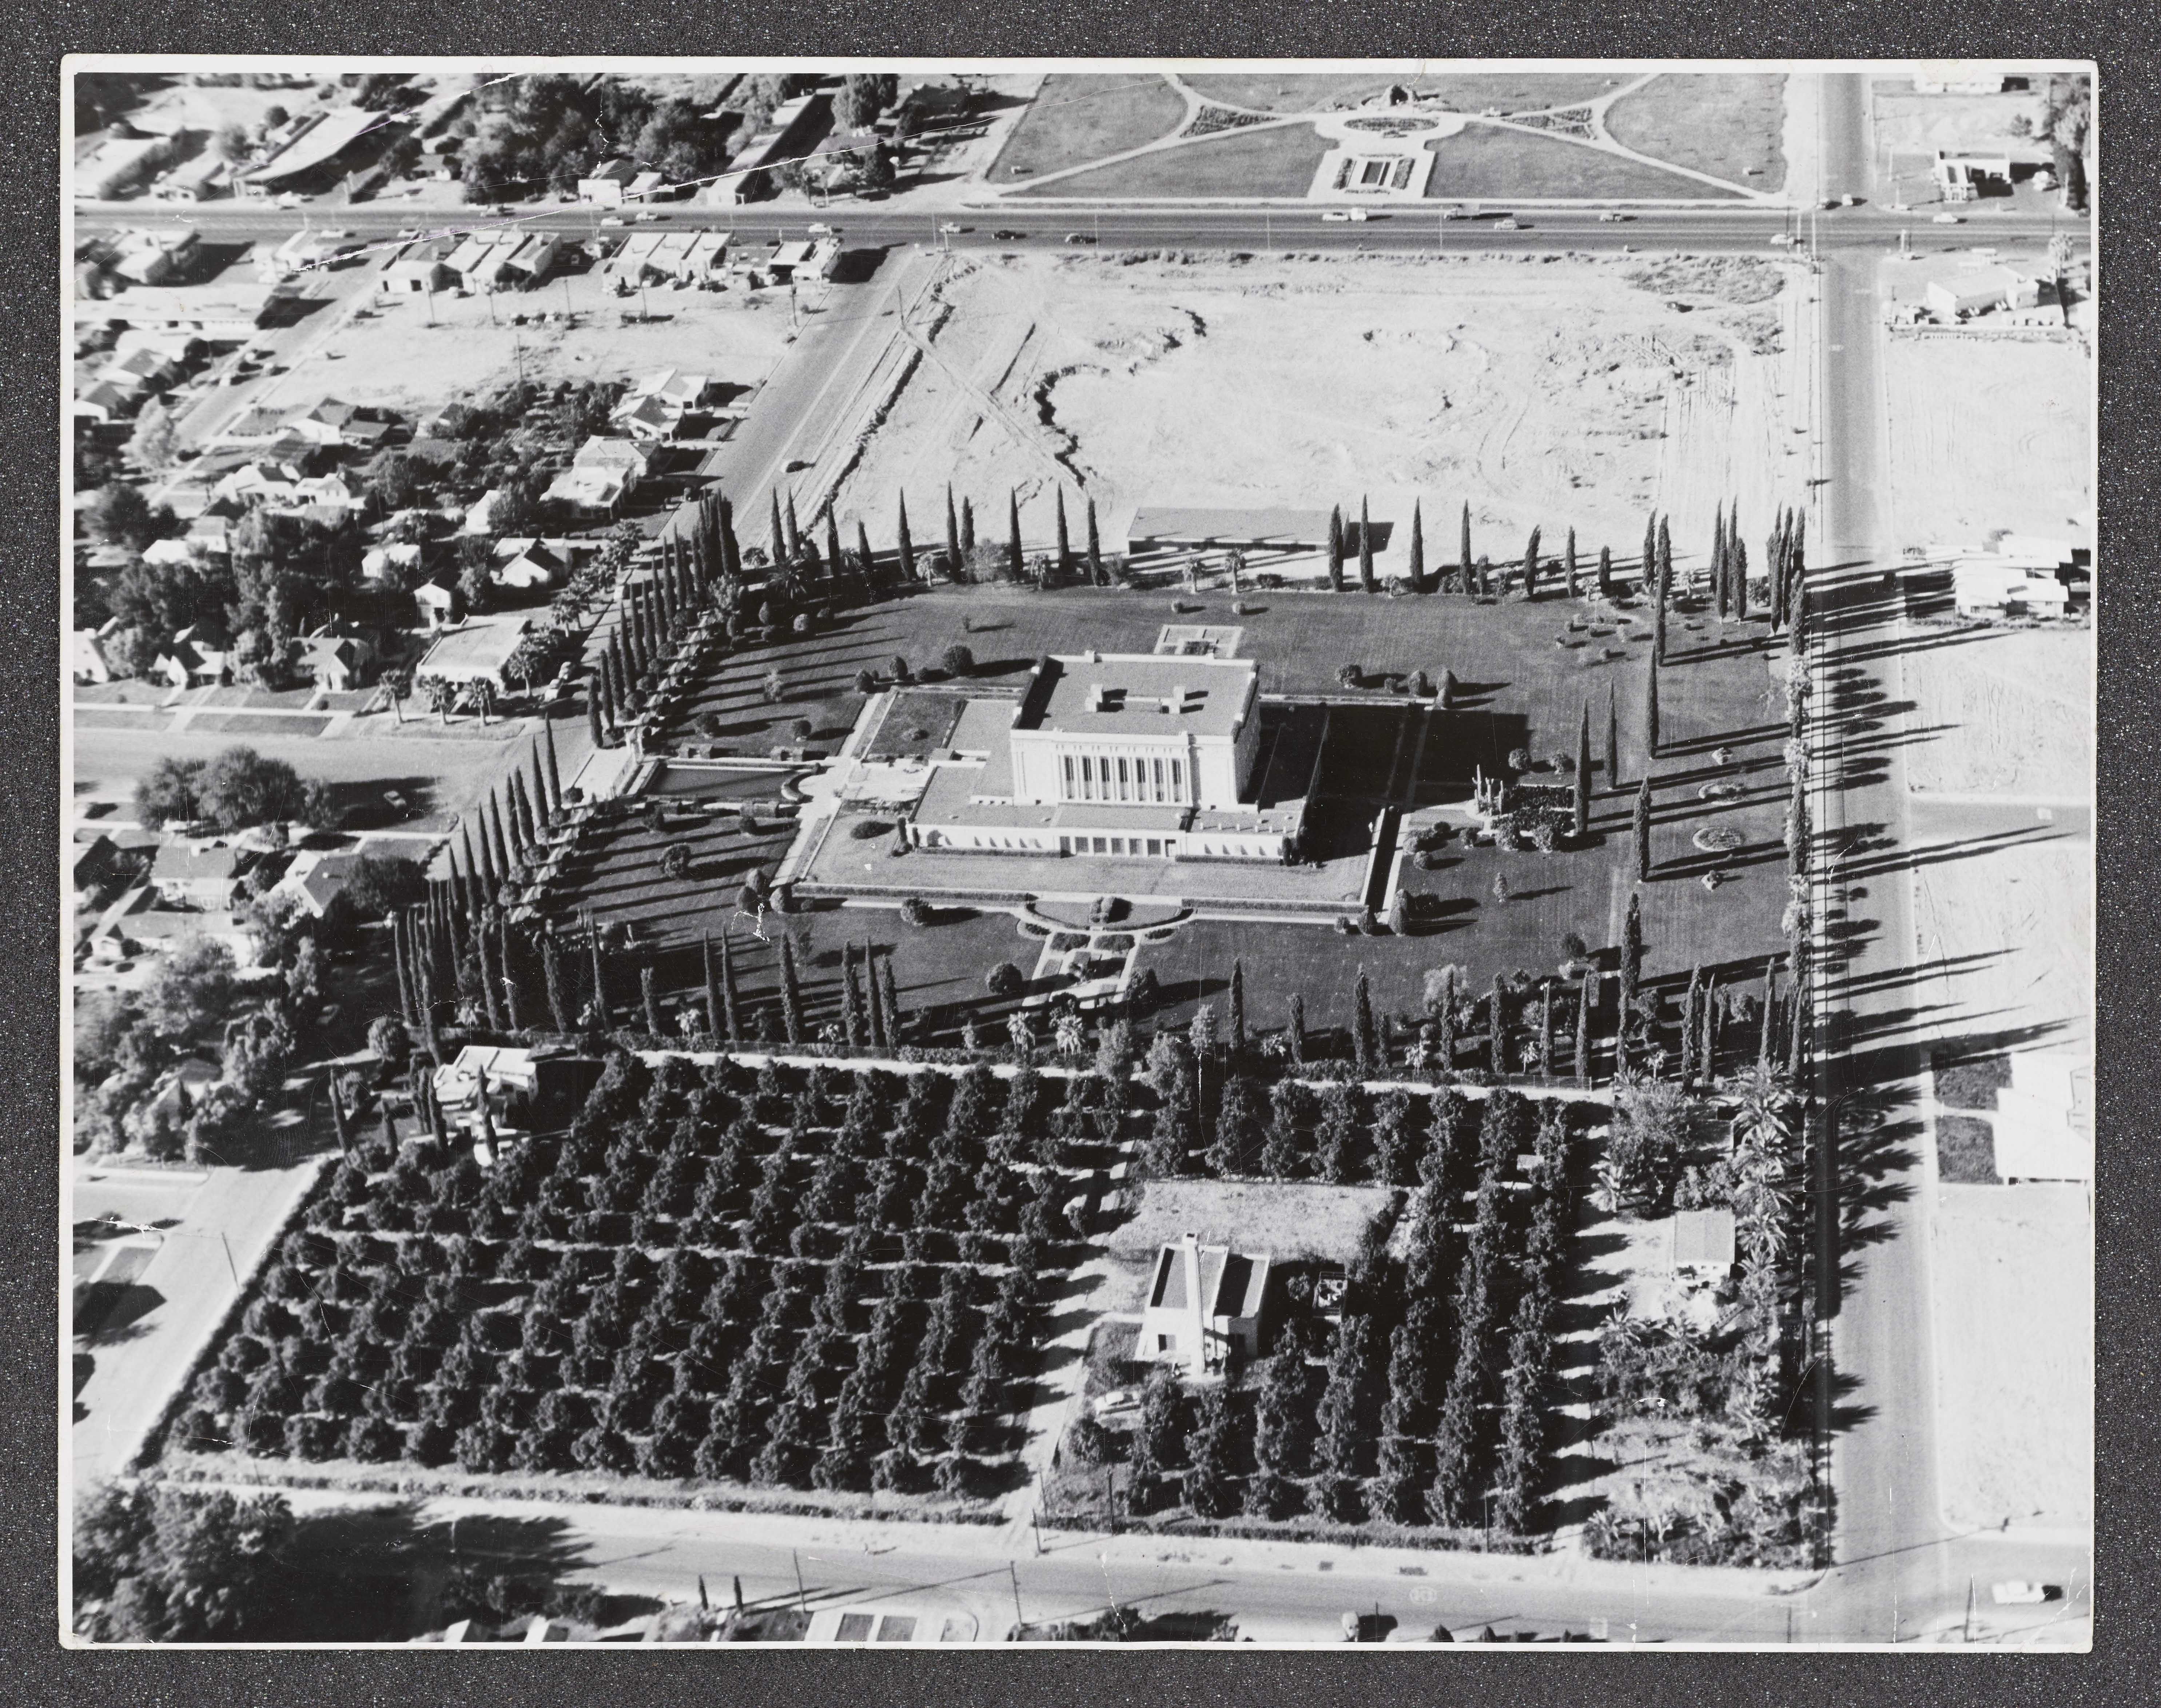 The Mesa Arizona Temple in the 1940s.